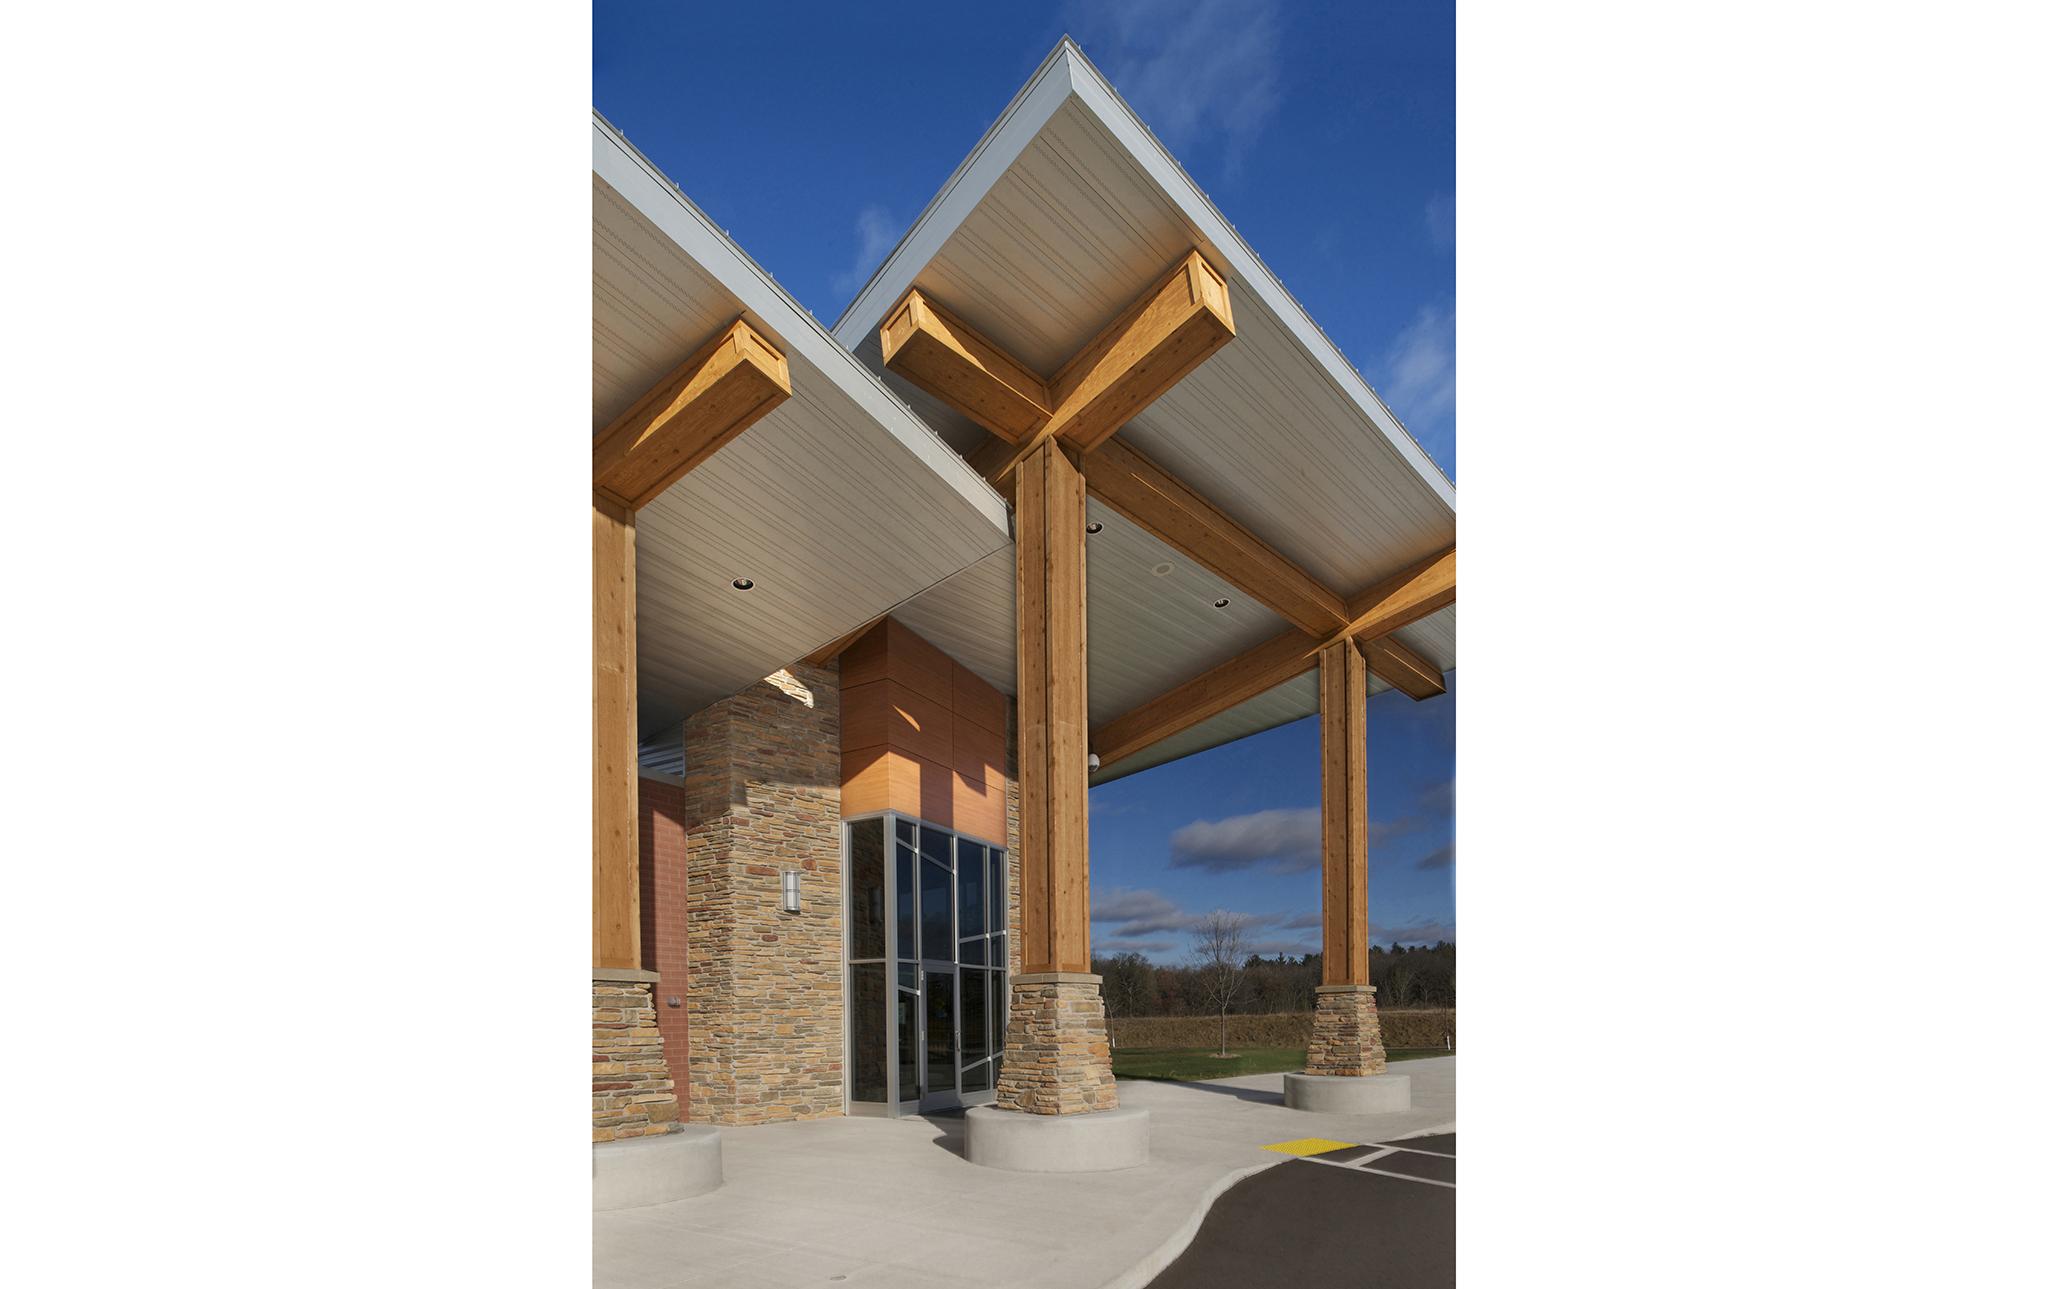 5_Menominee-Regional-Public-Transit-Center